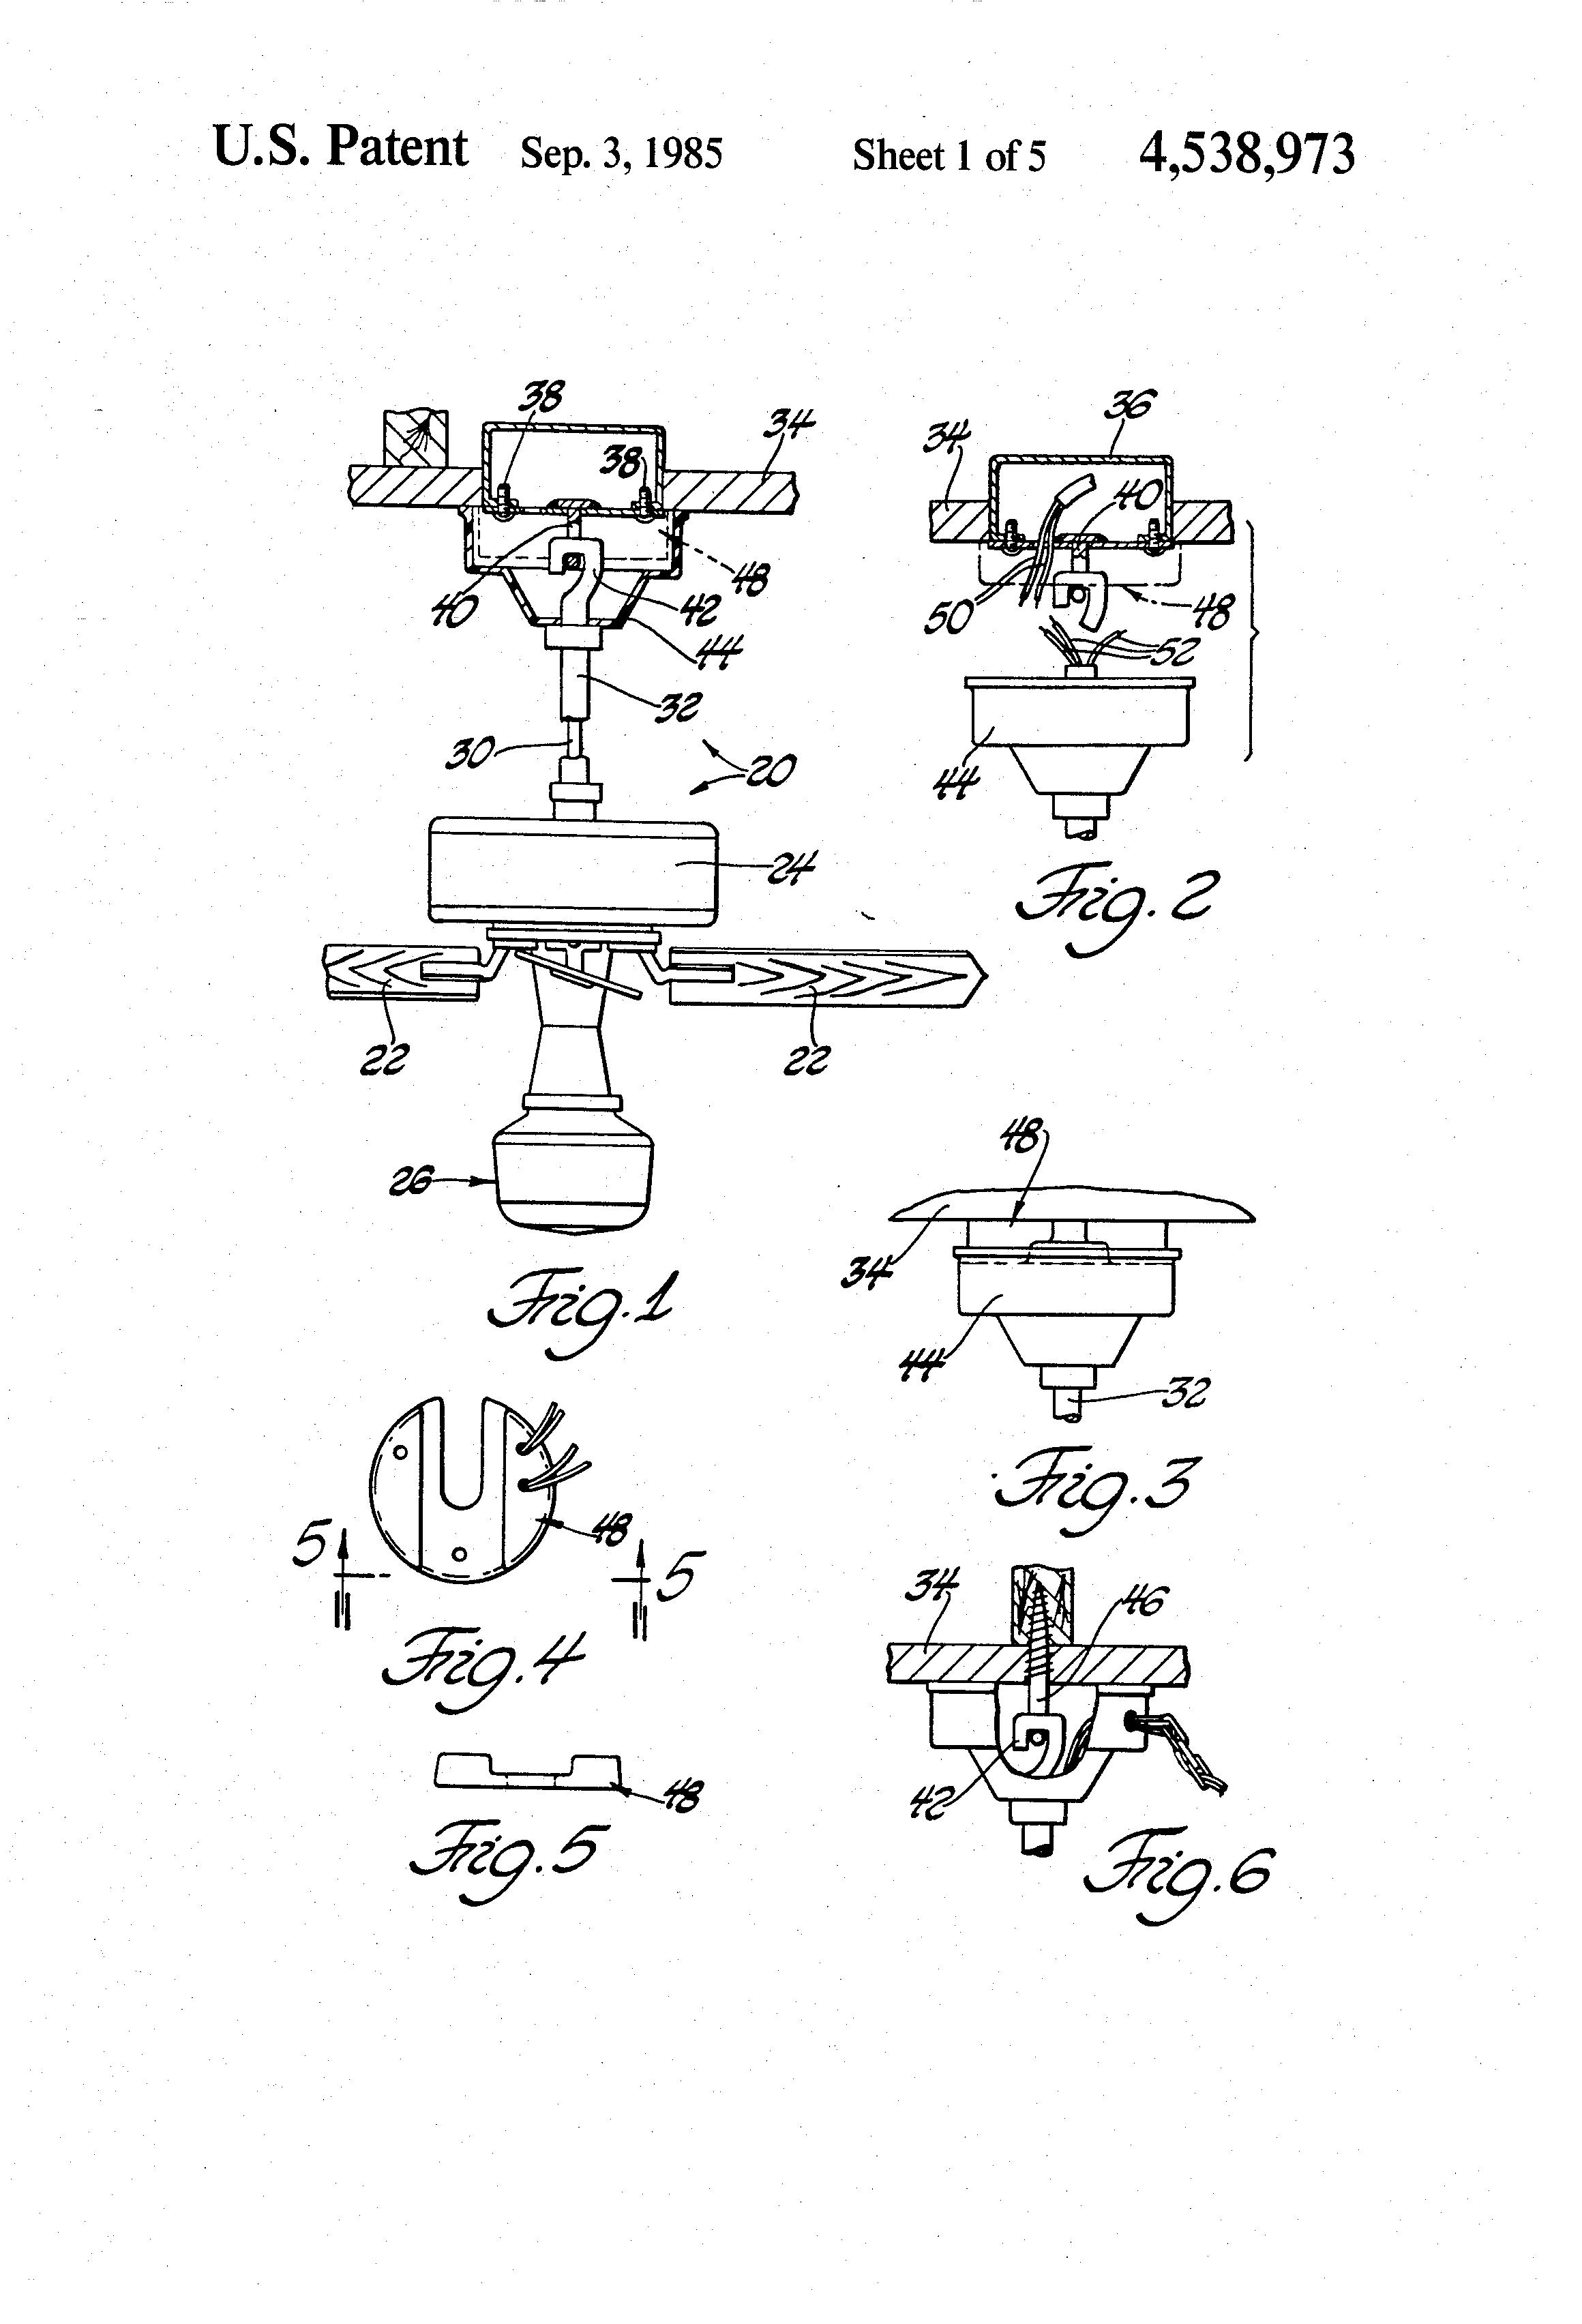 Encon Ceiling Fan Schematic Wiring Diagrams. Encon Ceiling Fan Parts Manual  Pranksenders